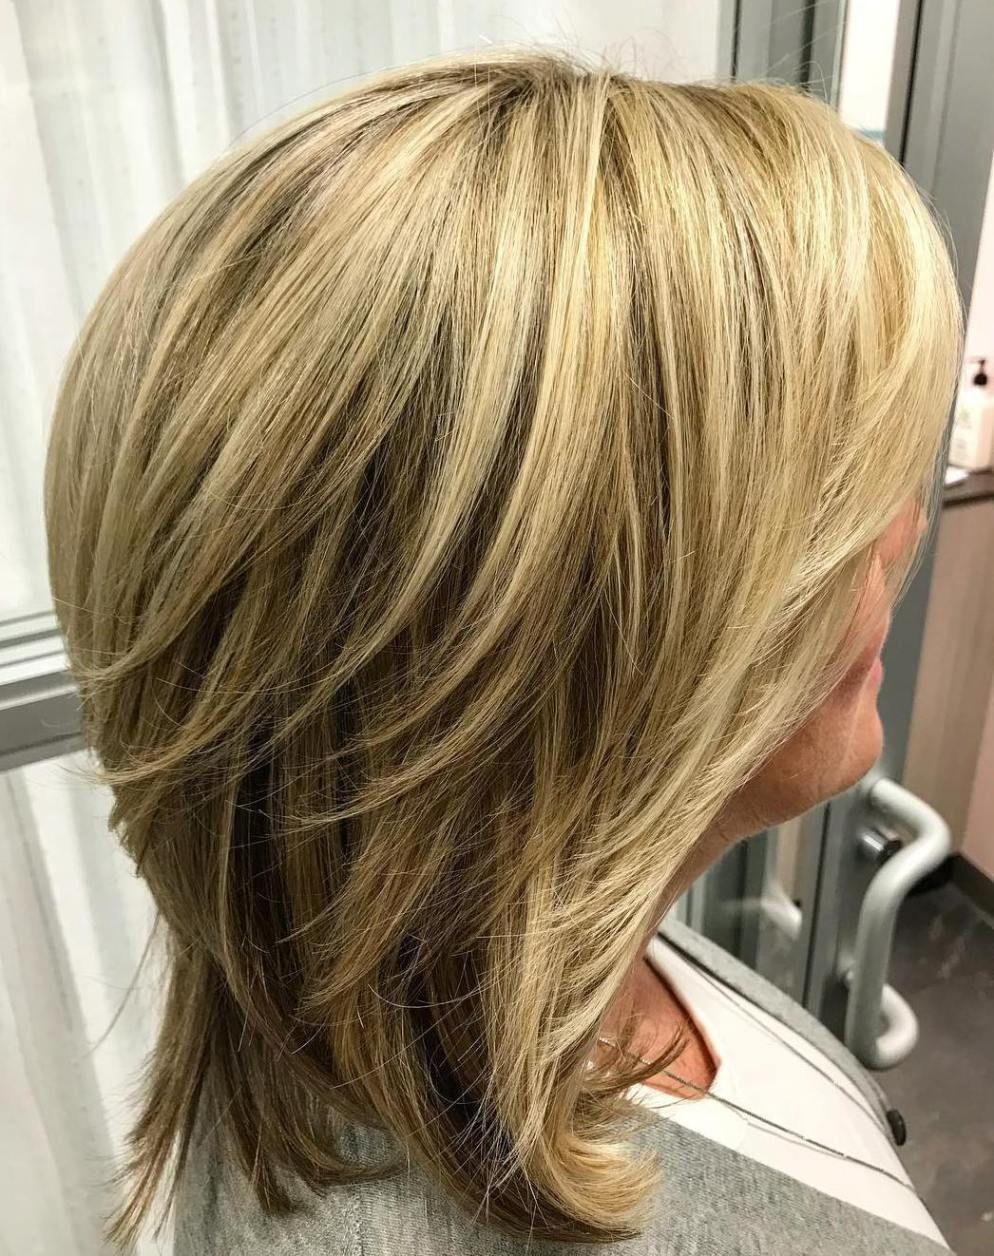 Shoulder Length Layered Blonde Hairstyle Coiffures Coupes De Cheveux Modele Coiffure Cheveux Courts Coiffure Cheveux Mi Long